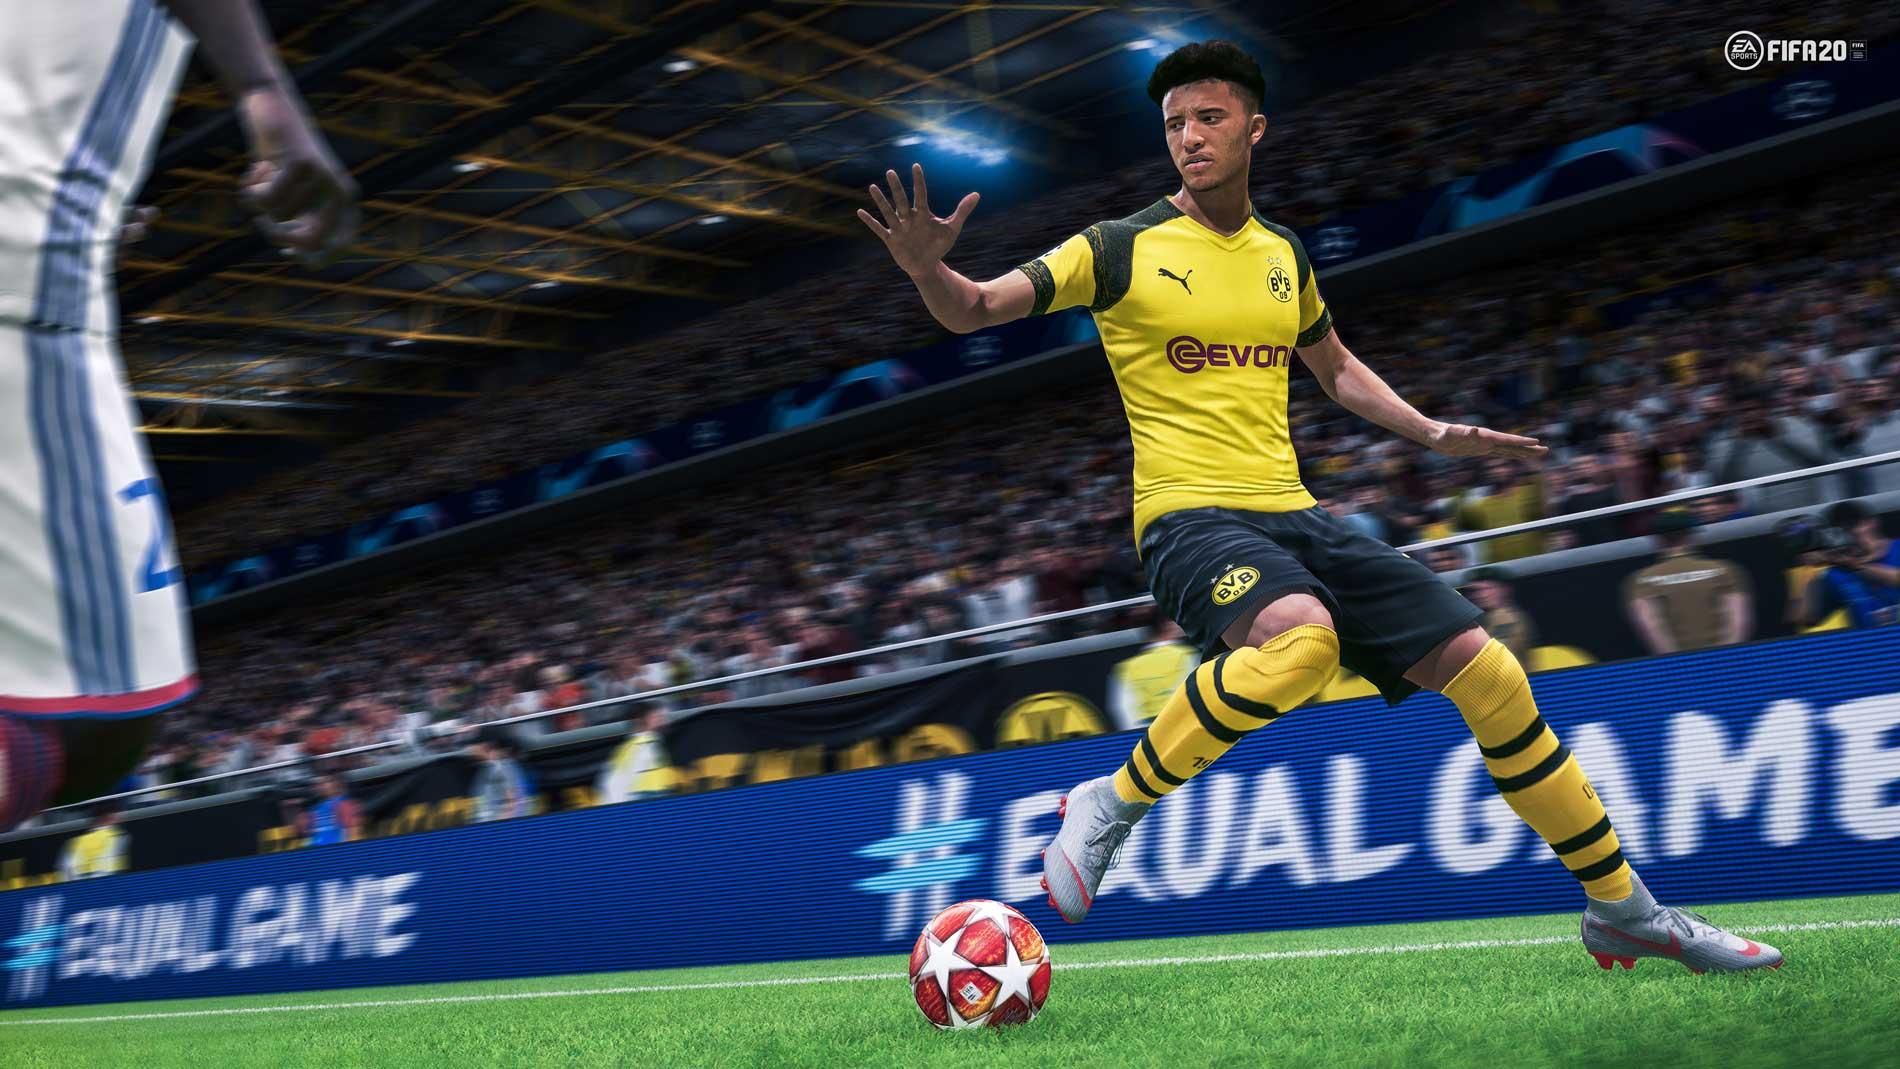 FIFA 20 Gameplay 1